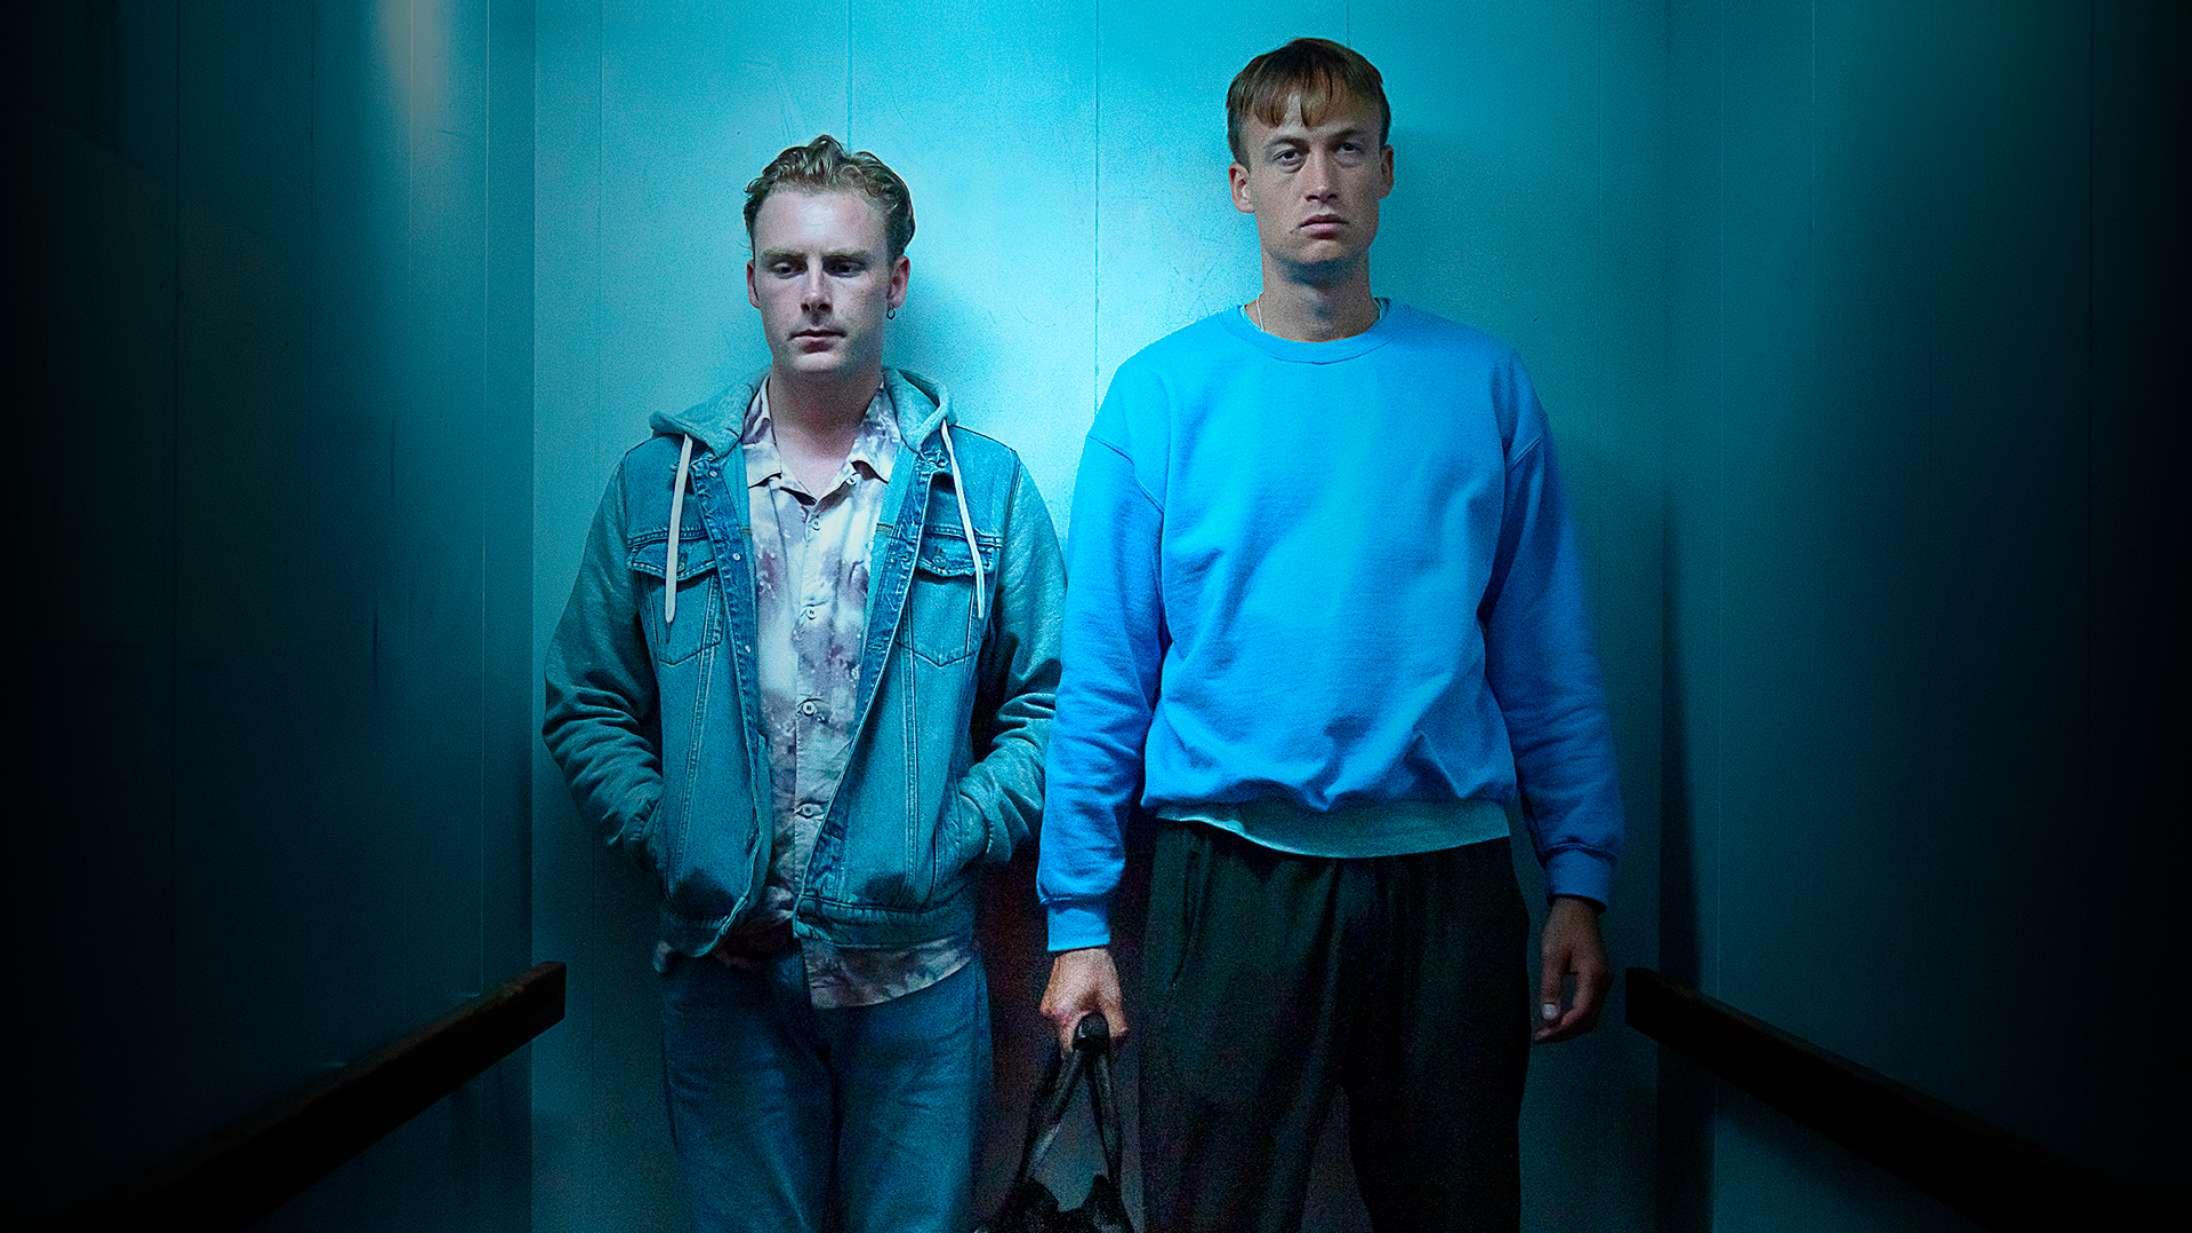 '2 døgn' er en hårdkogt ny dansk actionserie – se teaseren med nyt Jamaika-nummer på lydsiden